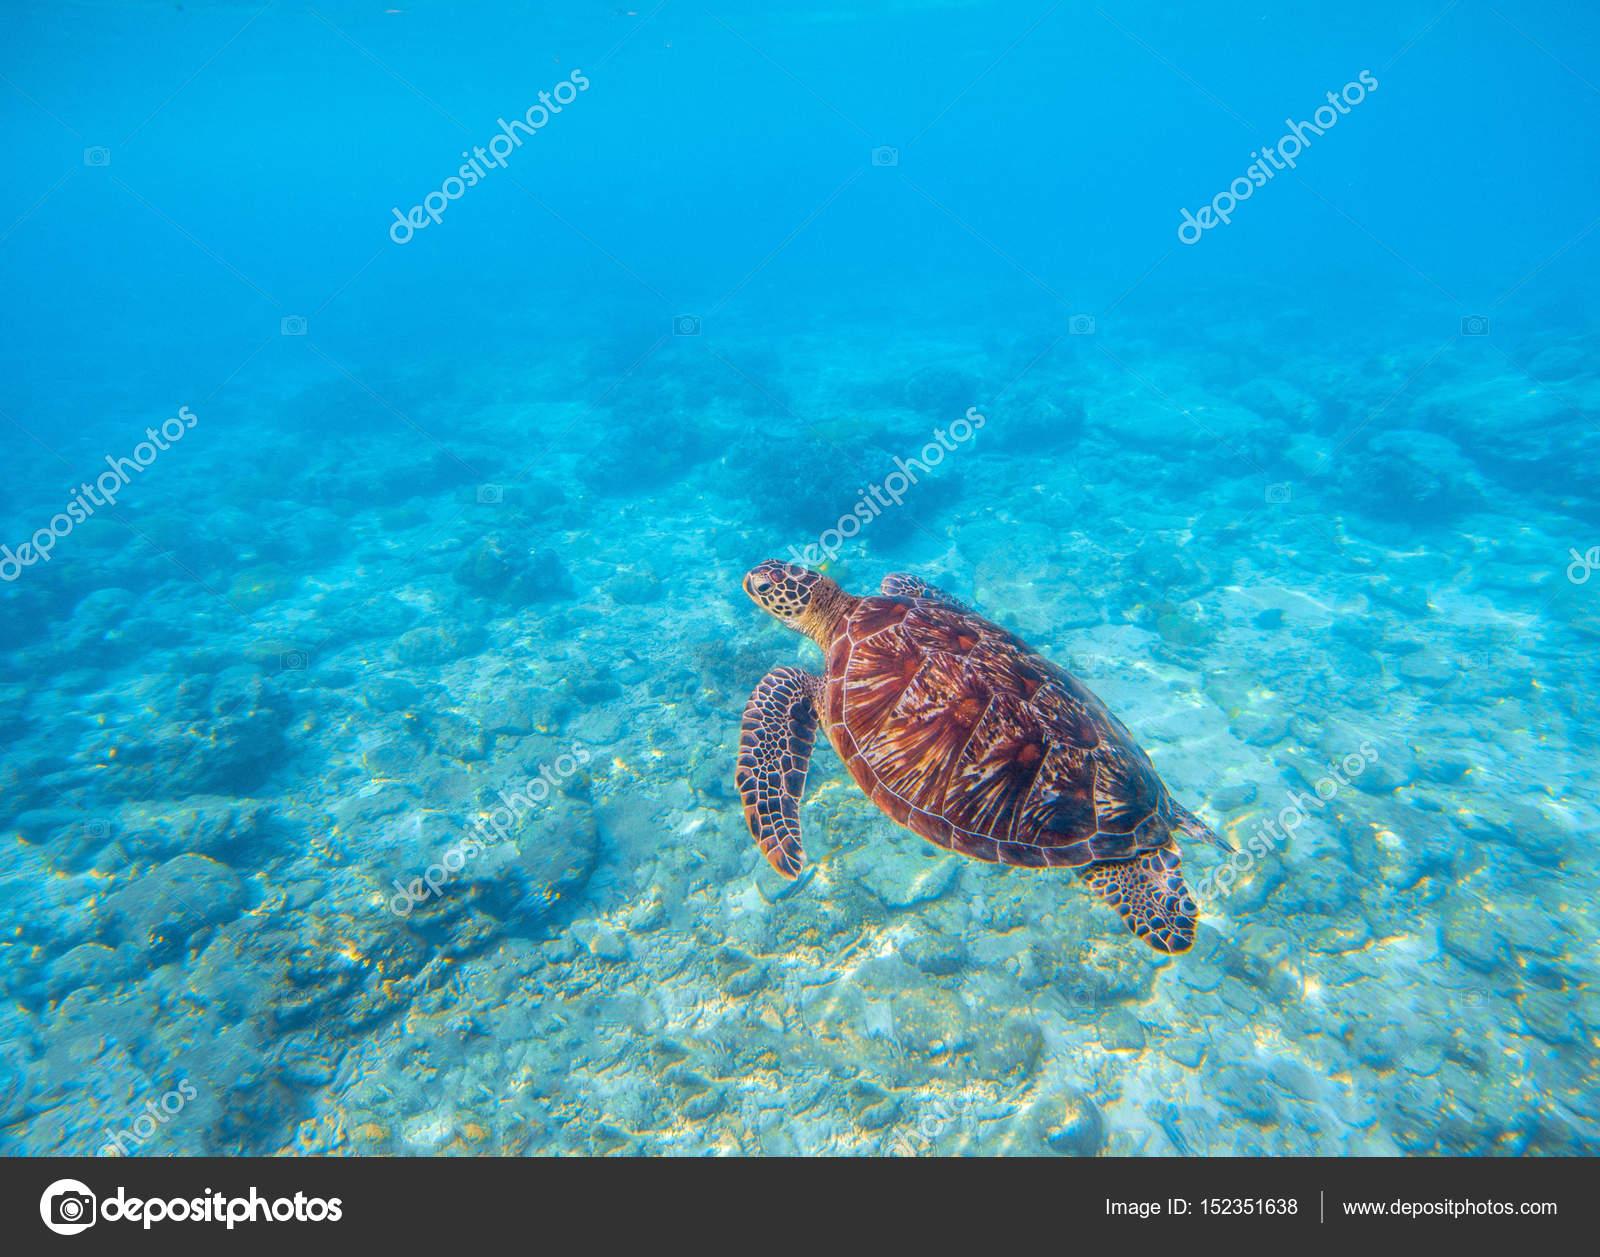 marine tortoise in water olive green turtle underwater photo sea